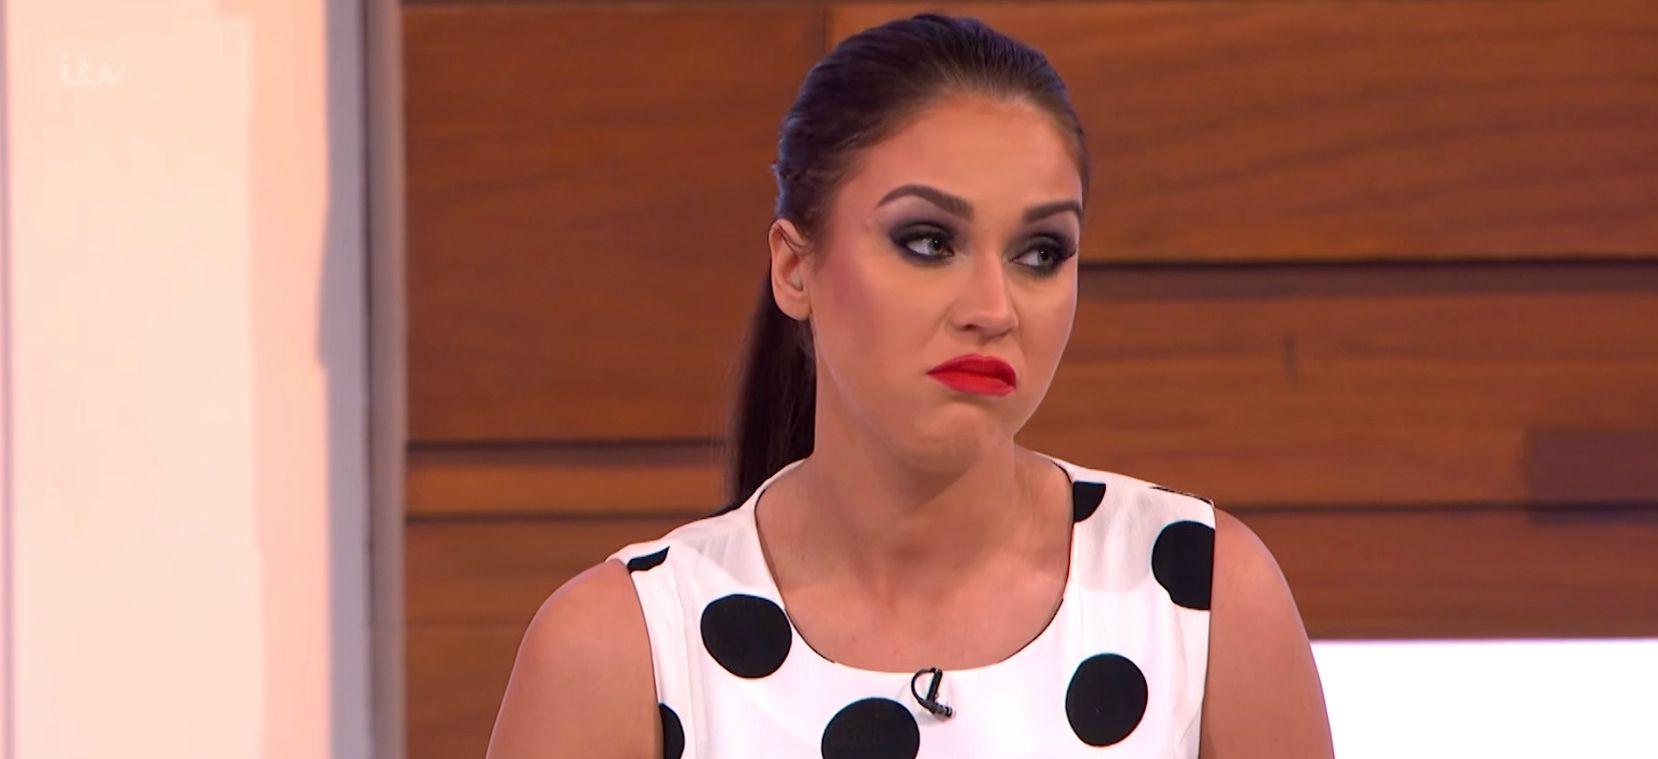 Vicky Pattison is not keen on having kids: 'It will destroy my vagina'